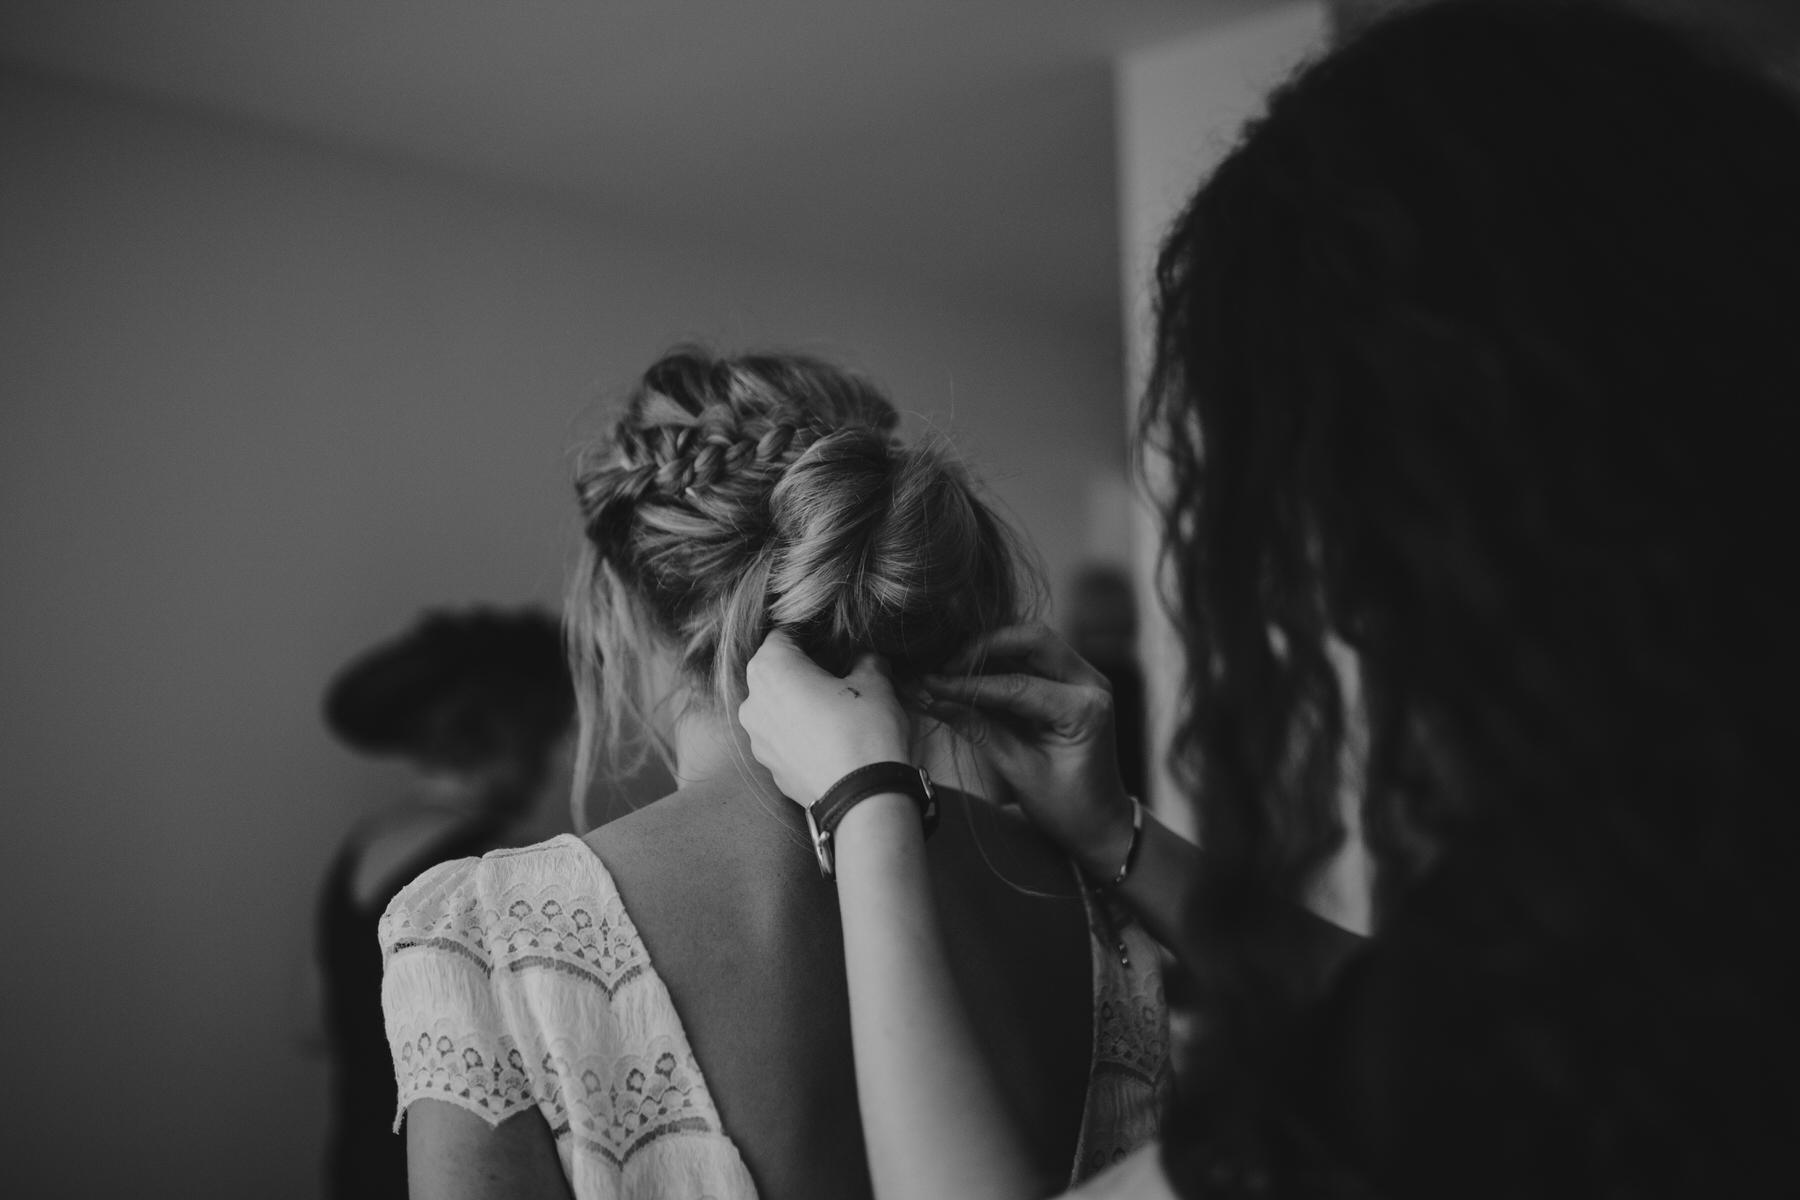 bride final touches to wedding hair during bridal preparations.jpg